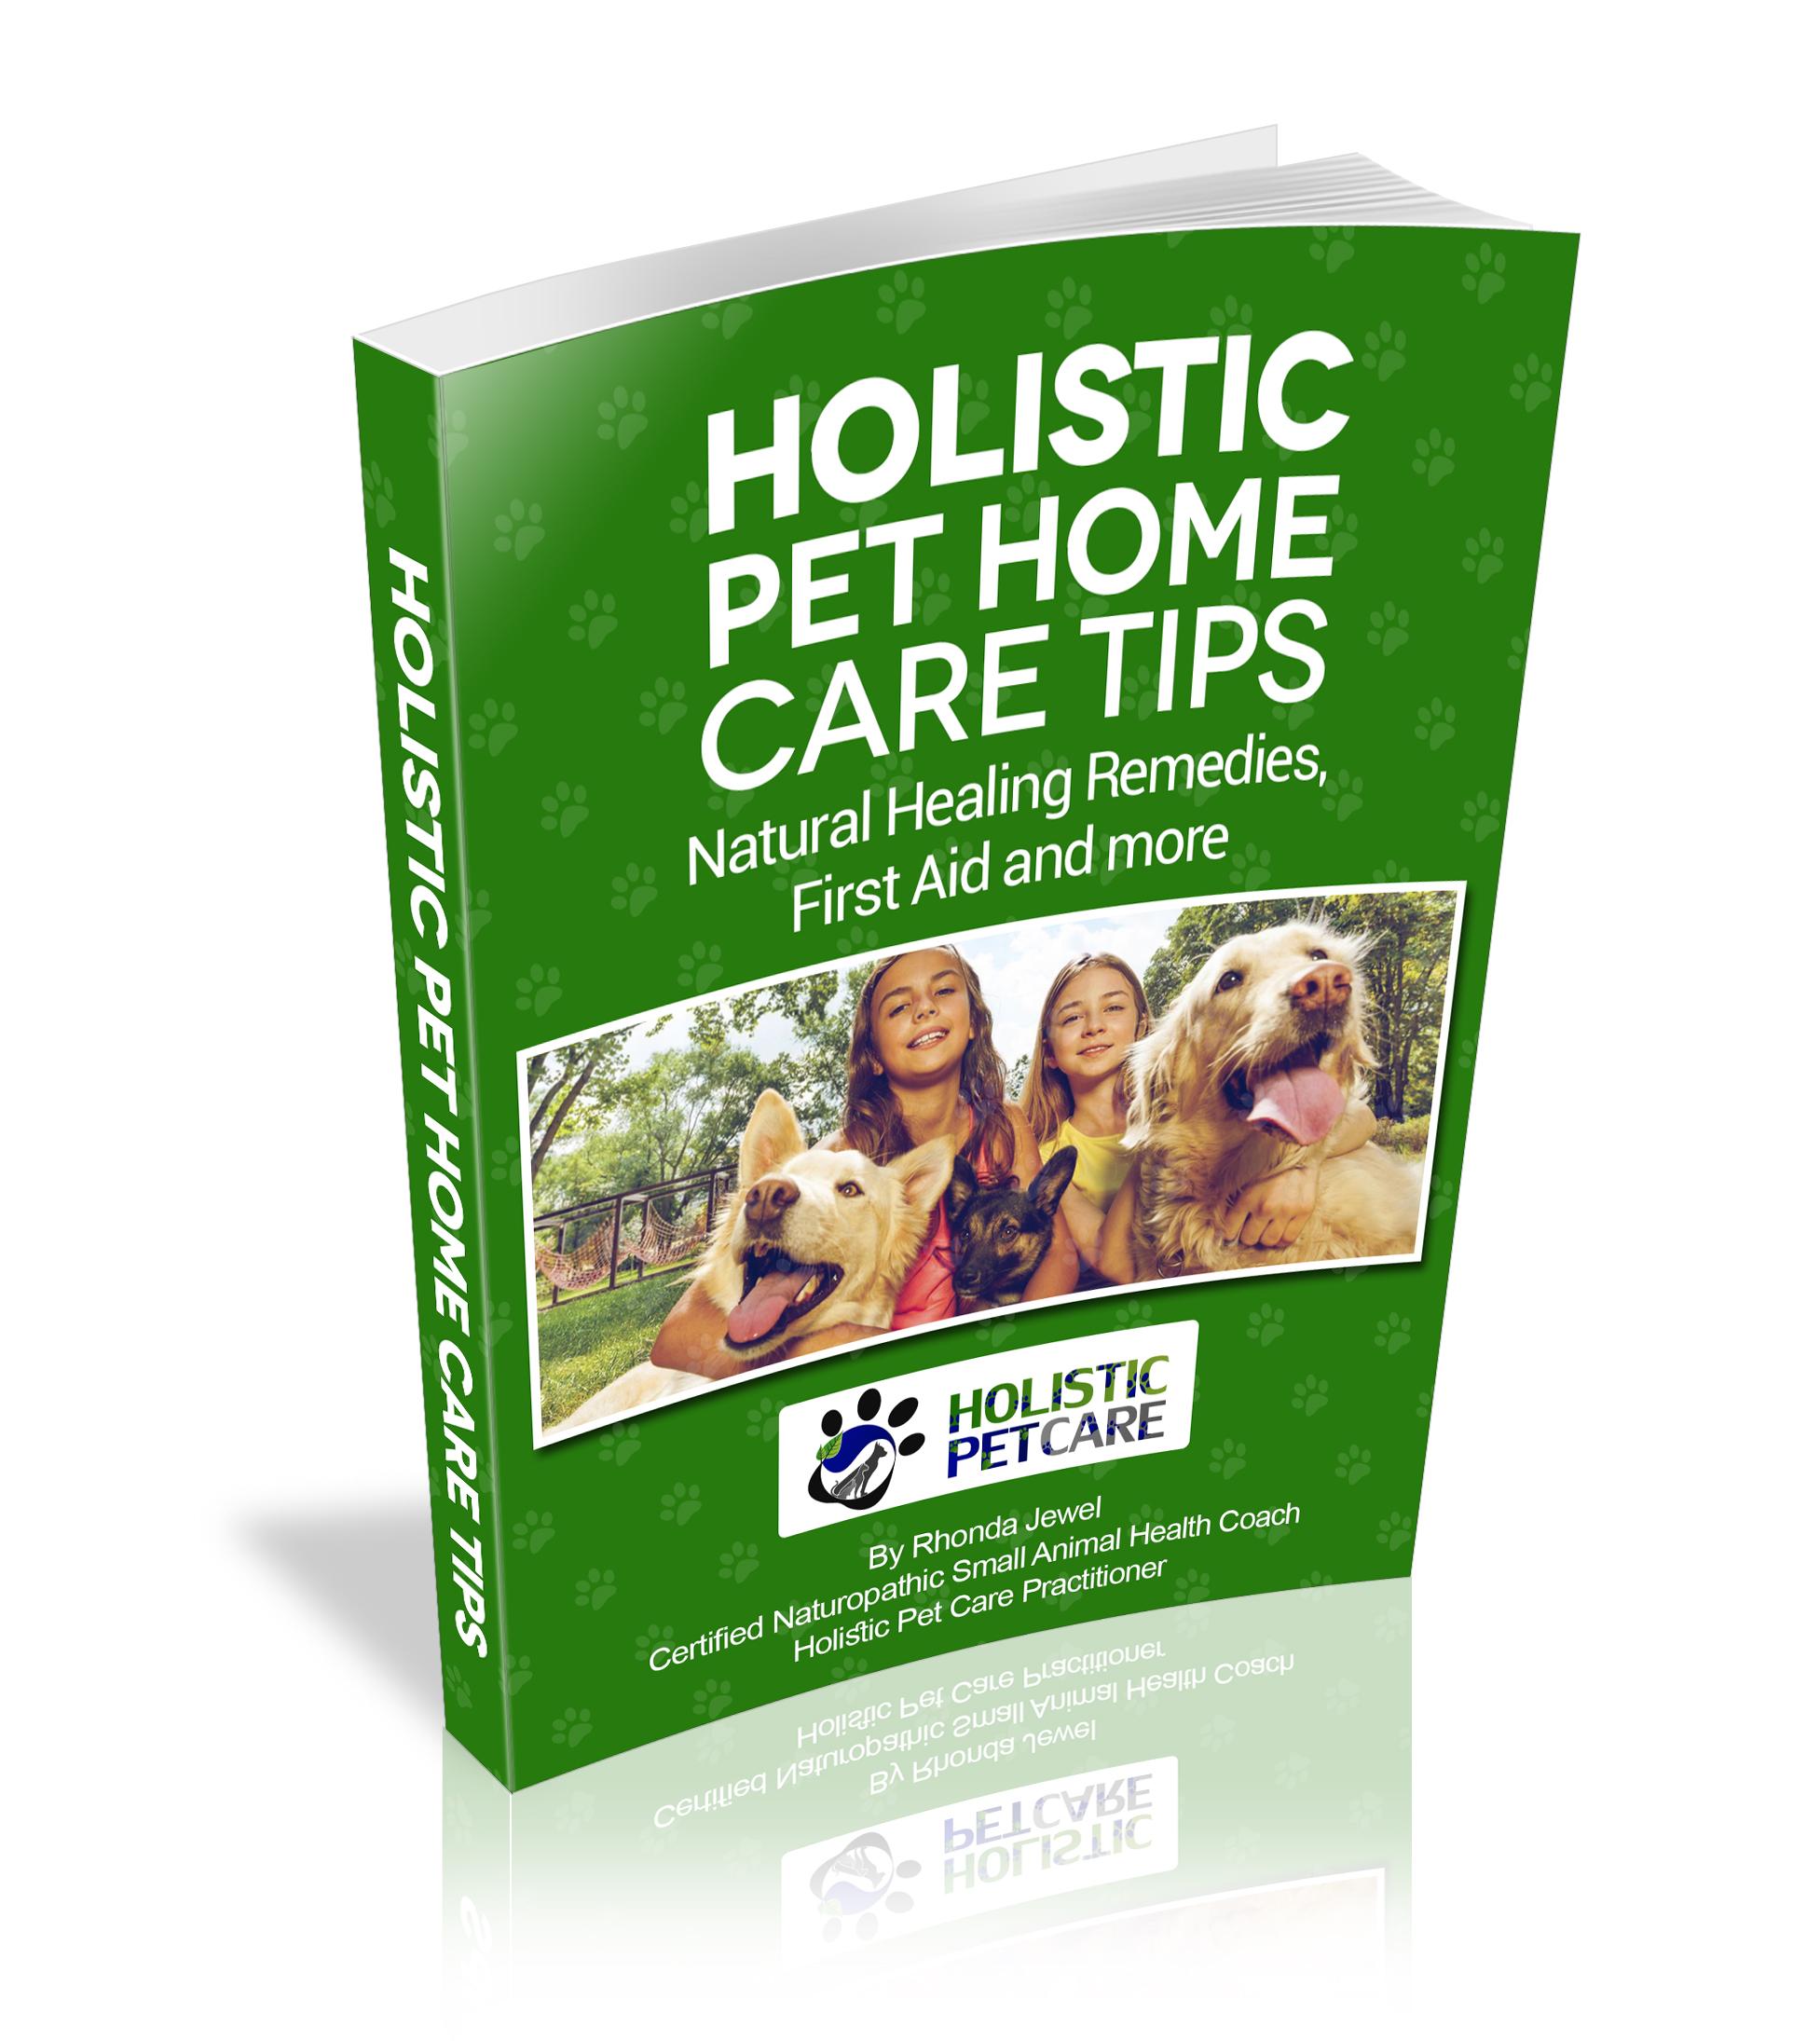 holistic-pet-home-care-tips-3d.jpg